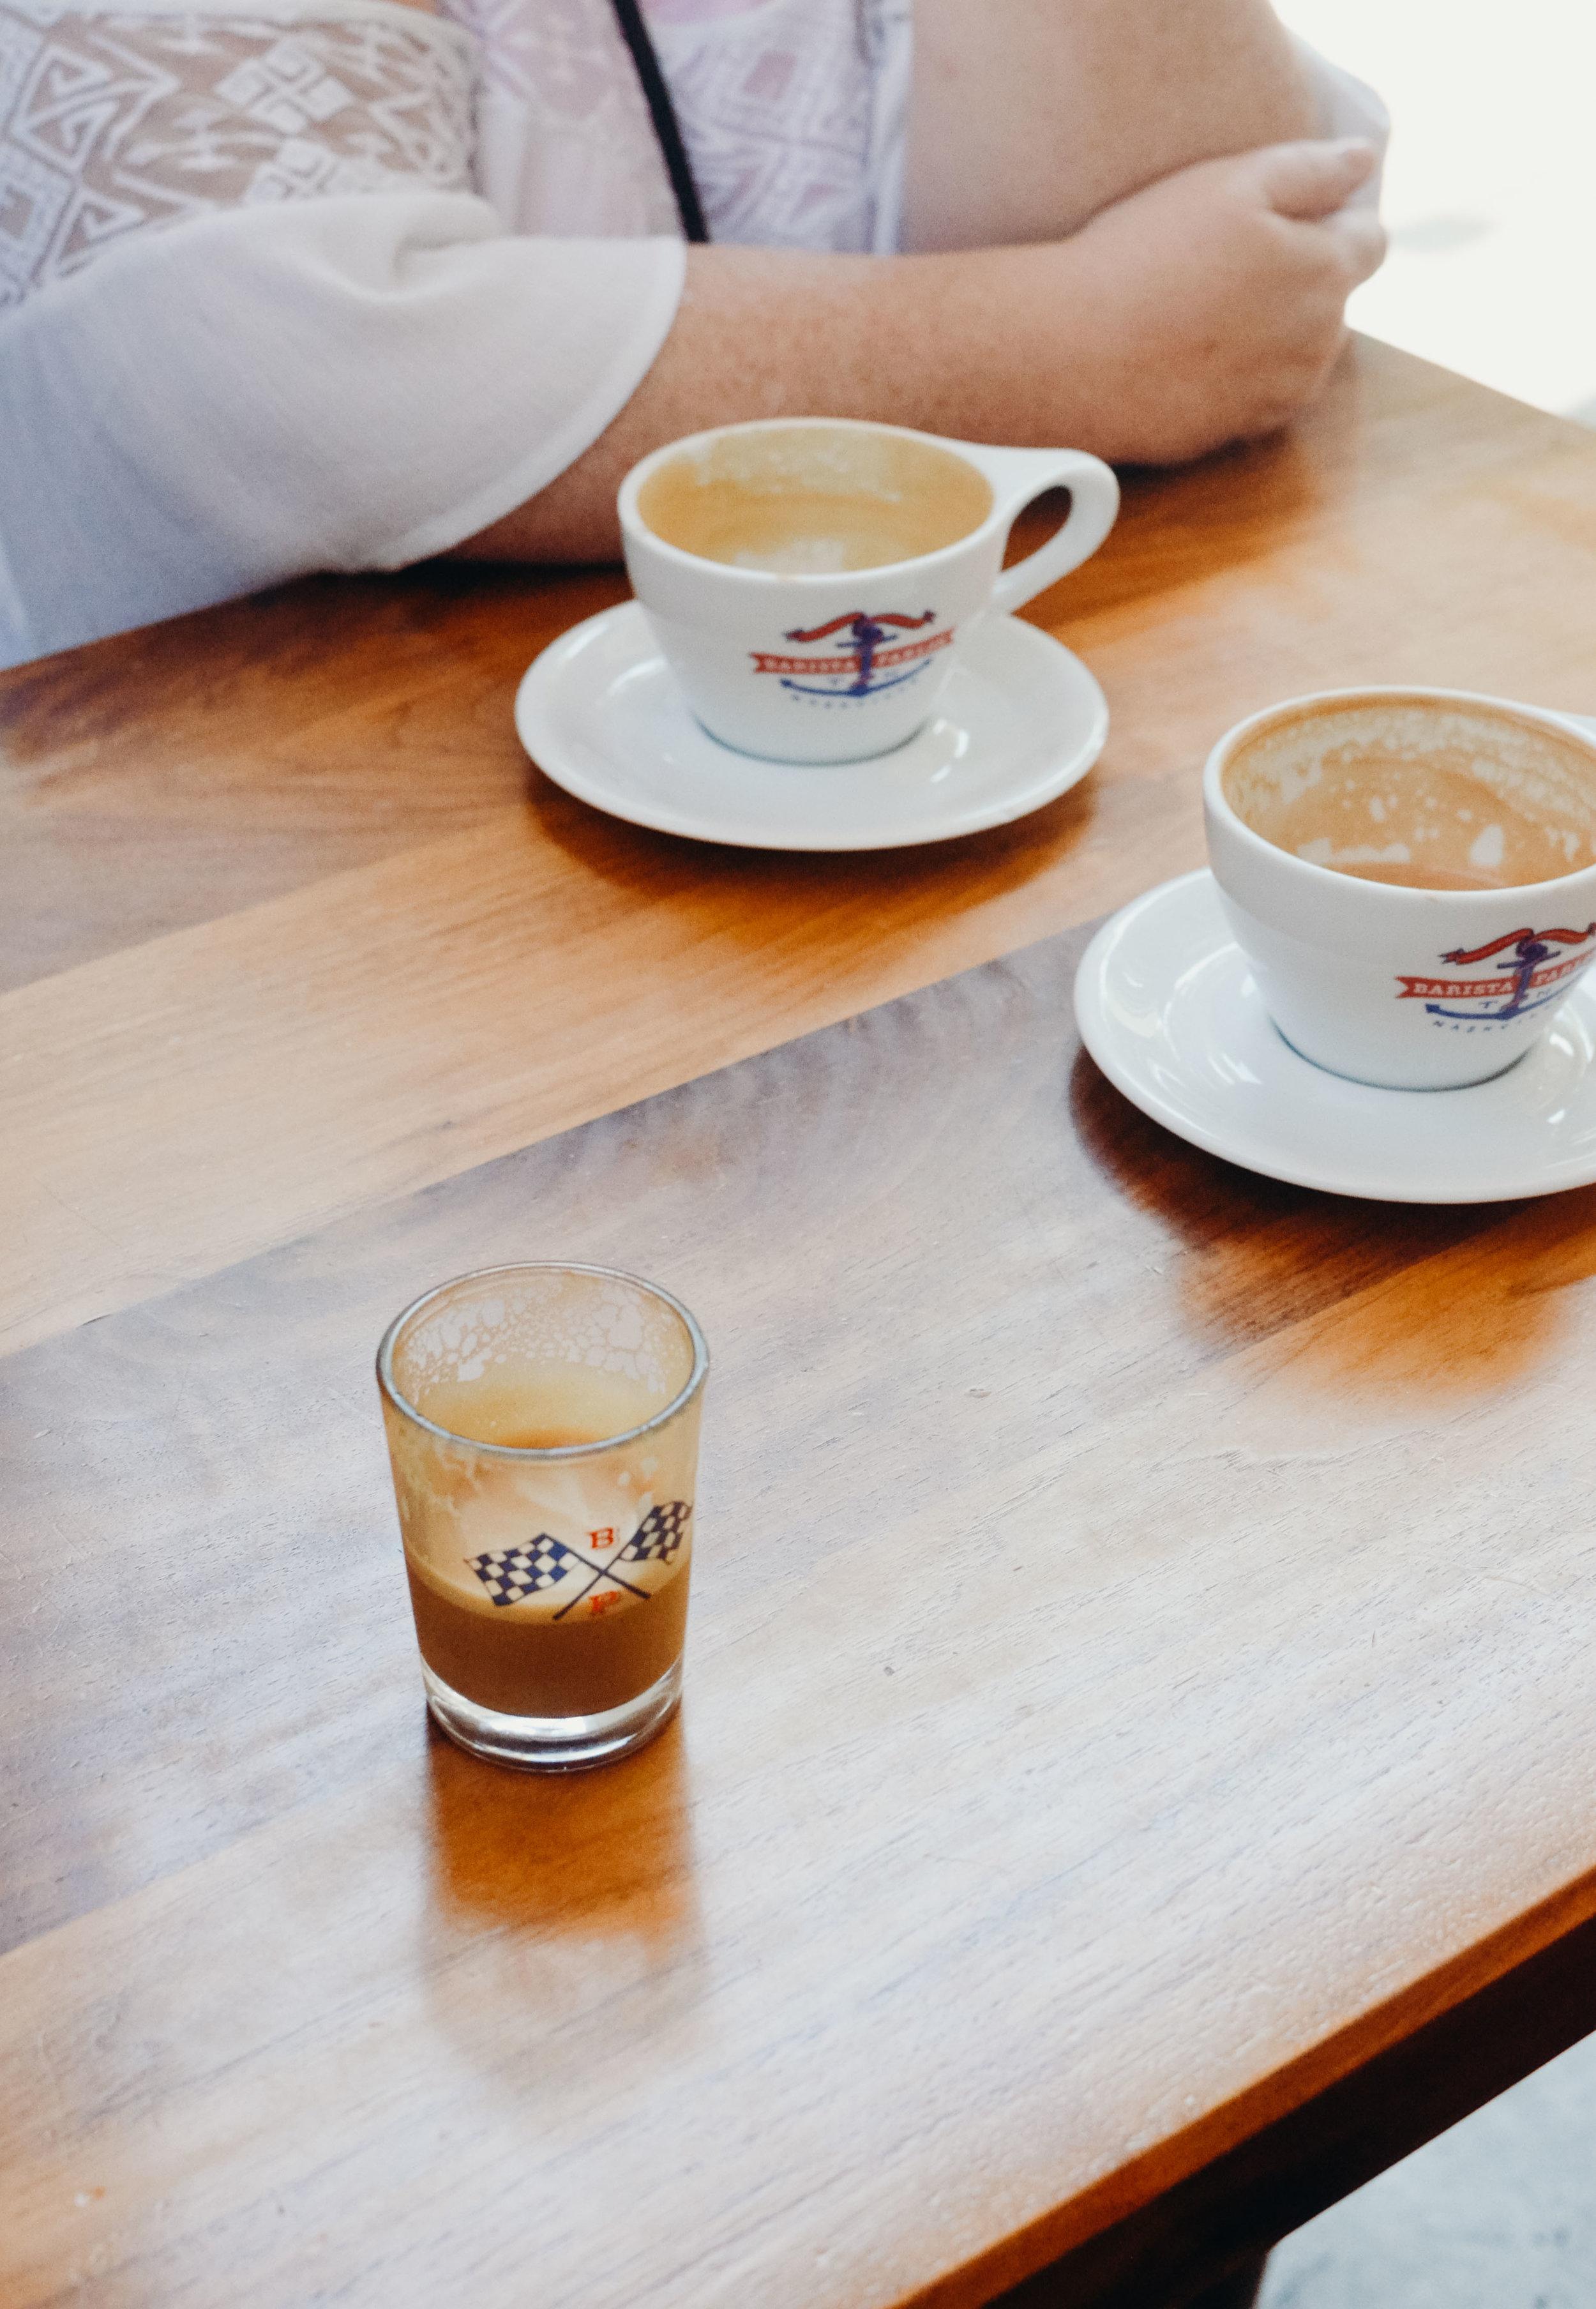 Wendling_Boyd_Barista_Parlor_Germantown_Nashville_Tennessee_Coffee_Culture_-16.jpg